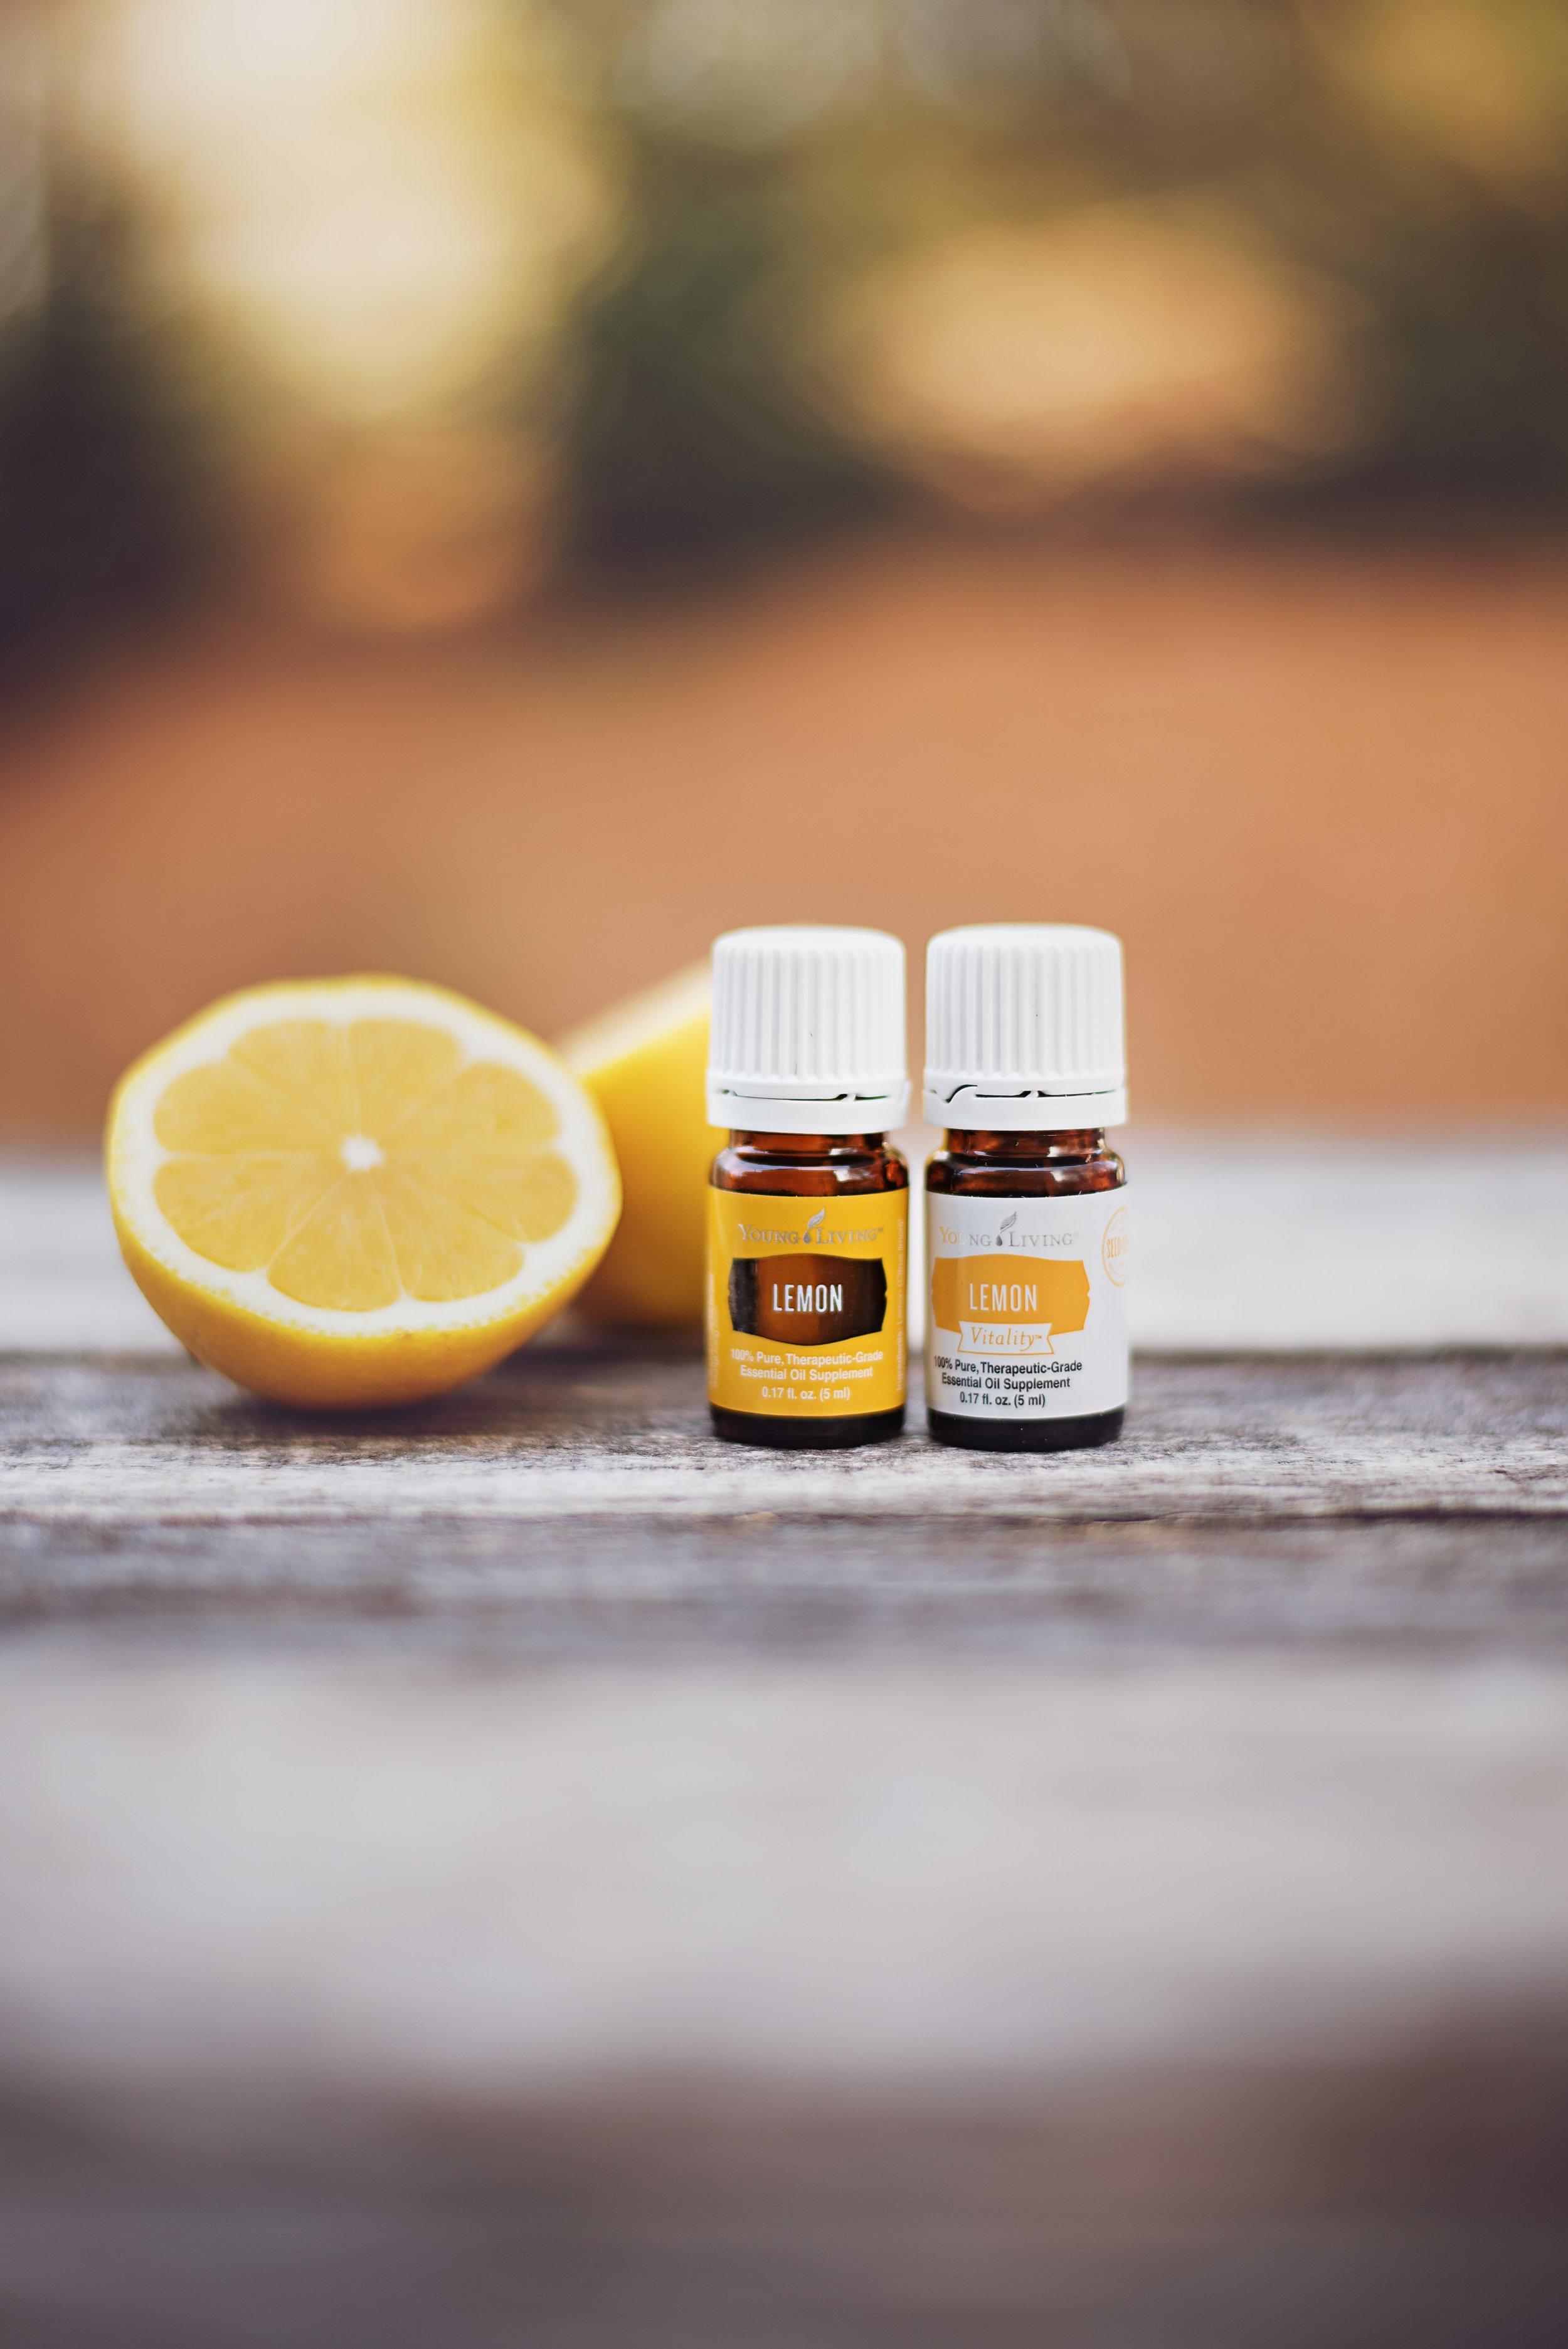 PRINT-lemon-and-lemon-vitality.jpg